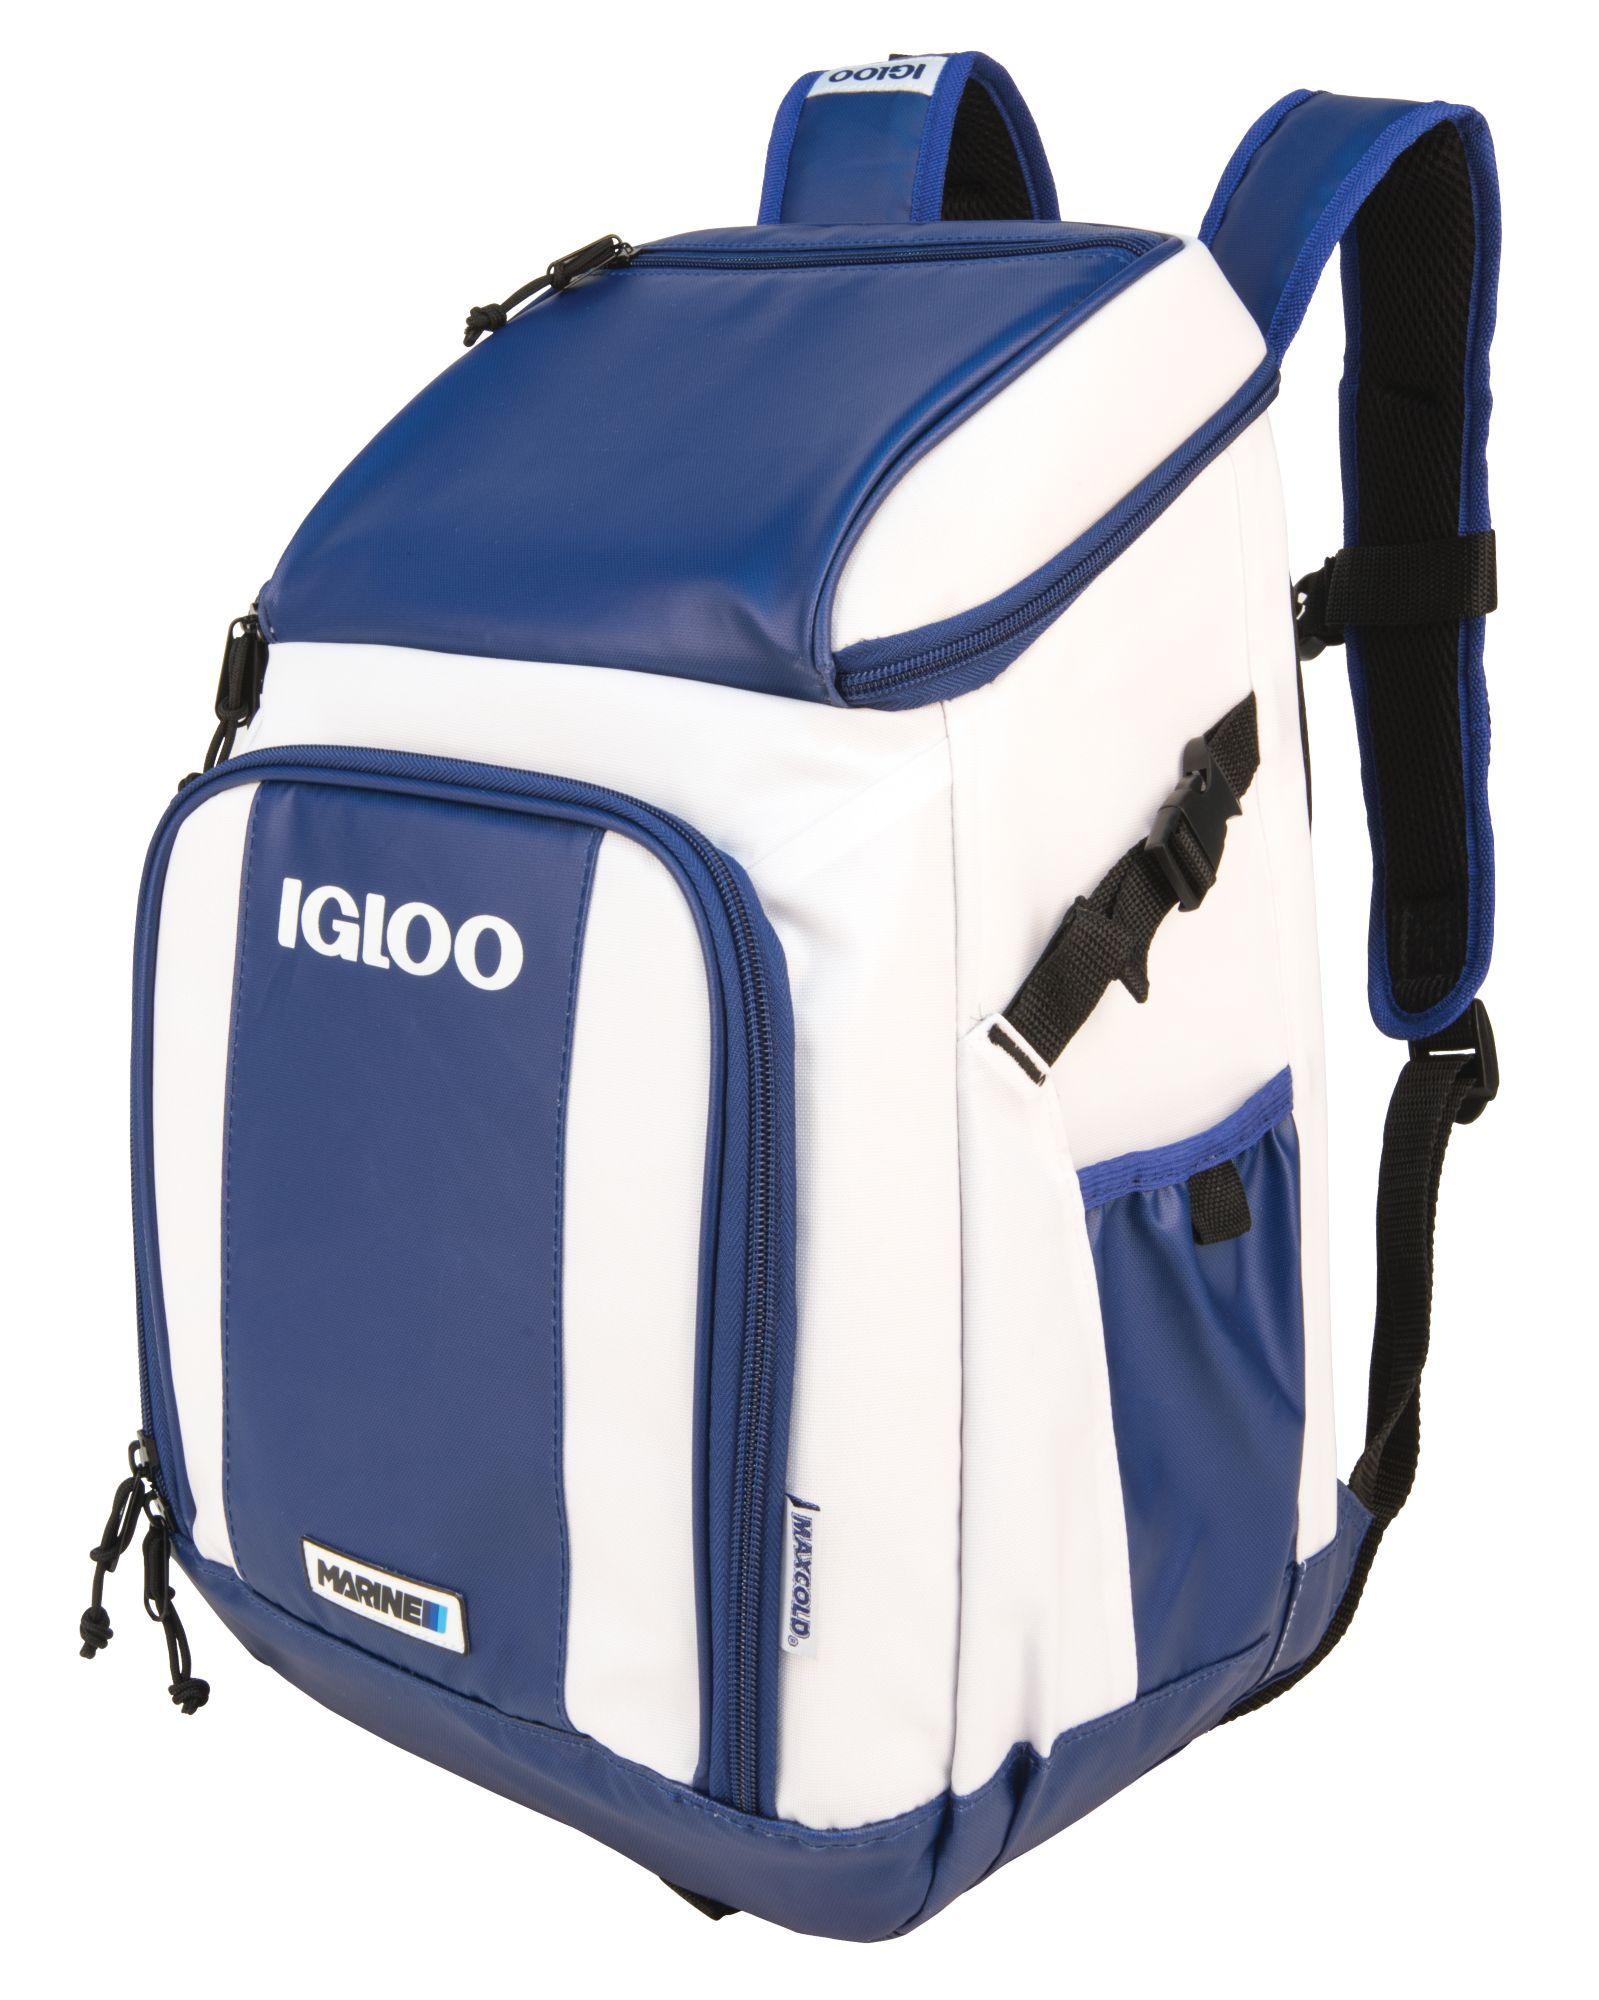 Igloo Marine Backpack Cooler Products In 2019 Marine